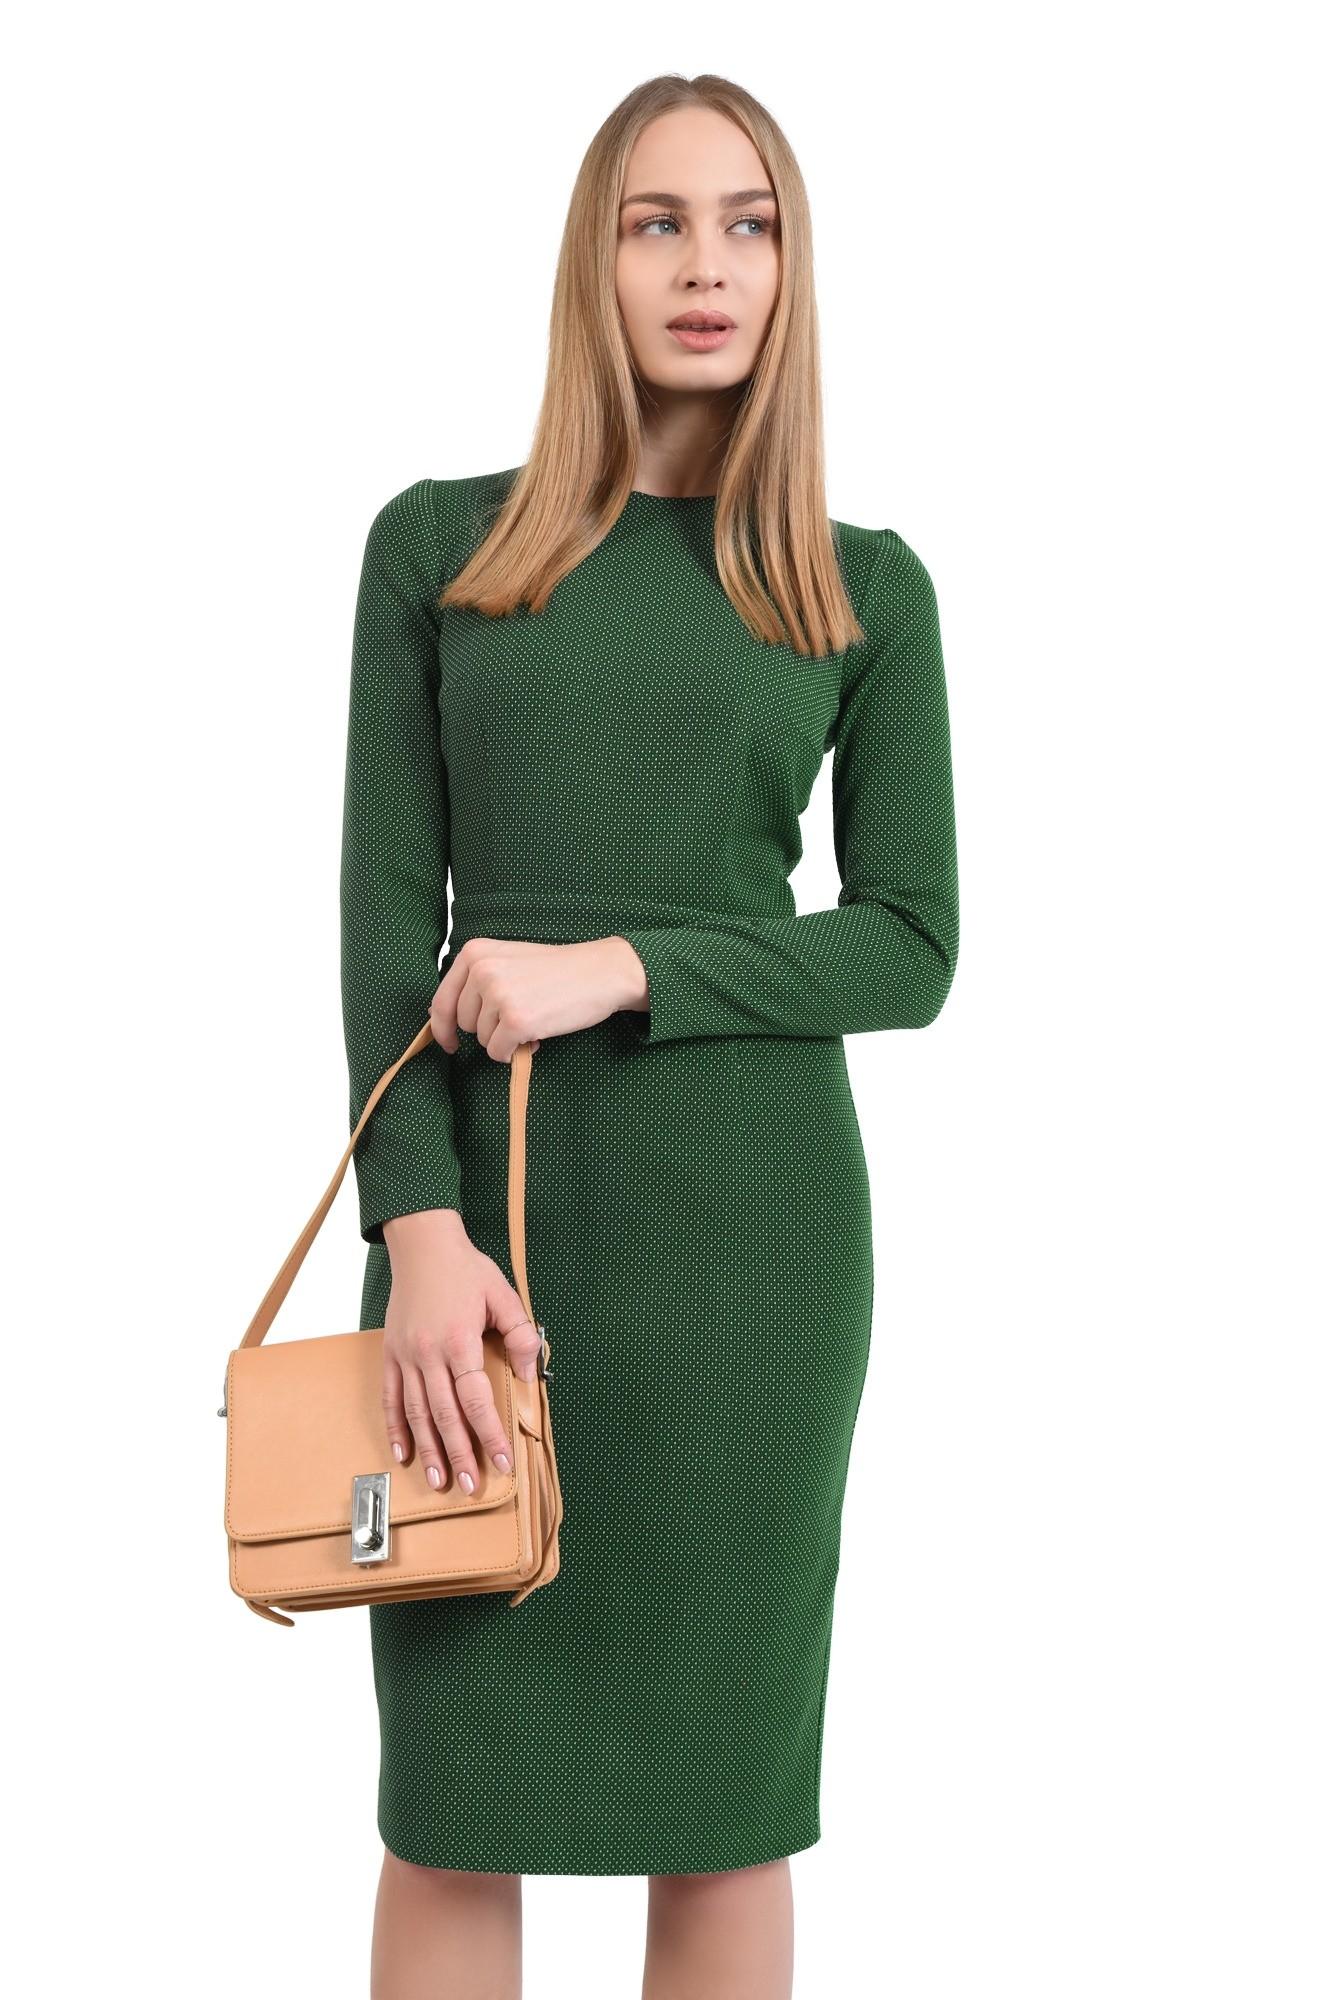 0 - rochie verde, creion, conica, midi, decolteu la baza gatului